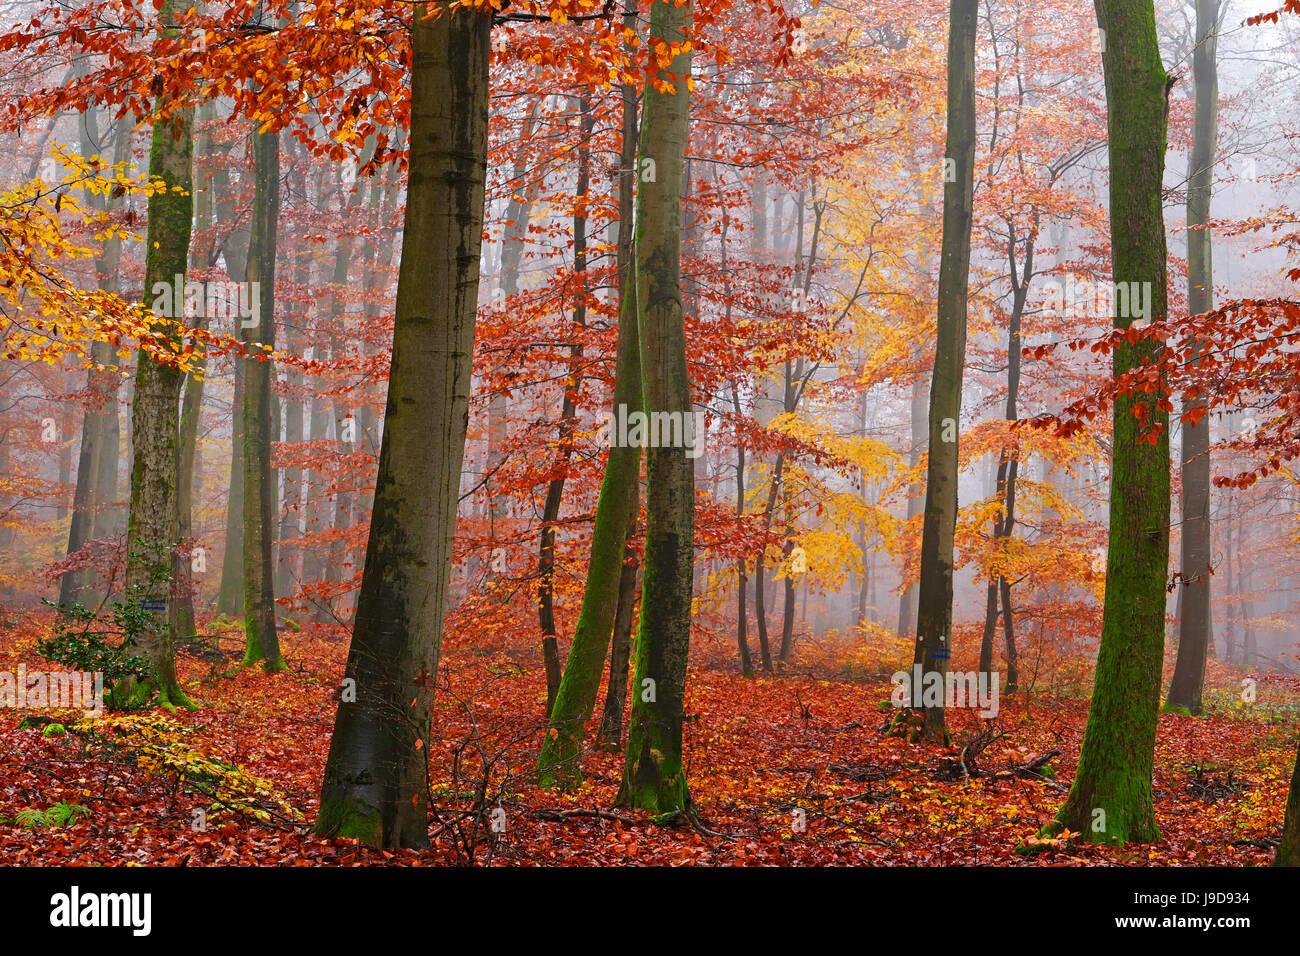 Autumnal forest, Kastel-Staadt, Rhineland-Palatinate (Rheinland-Pfalz), Germany, Europe - Stock Image